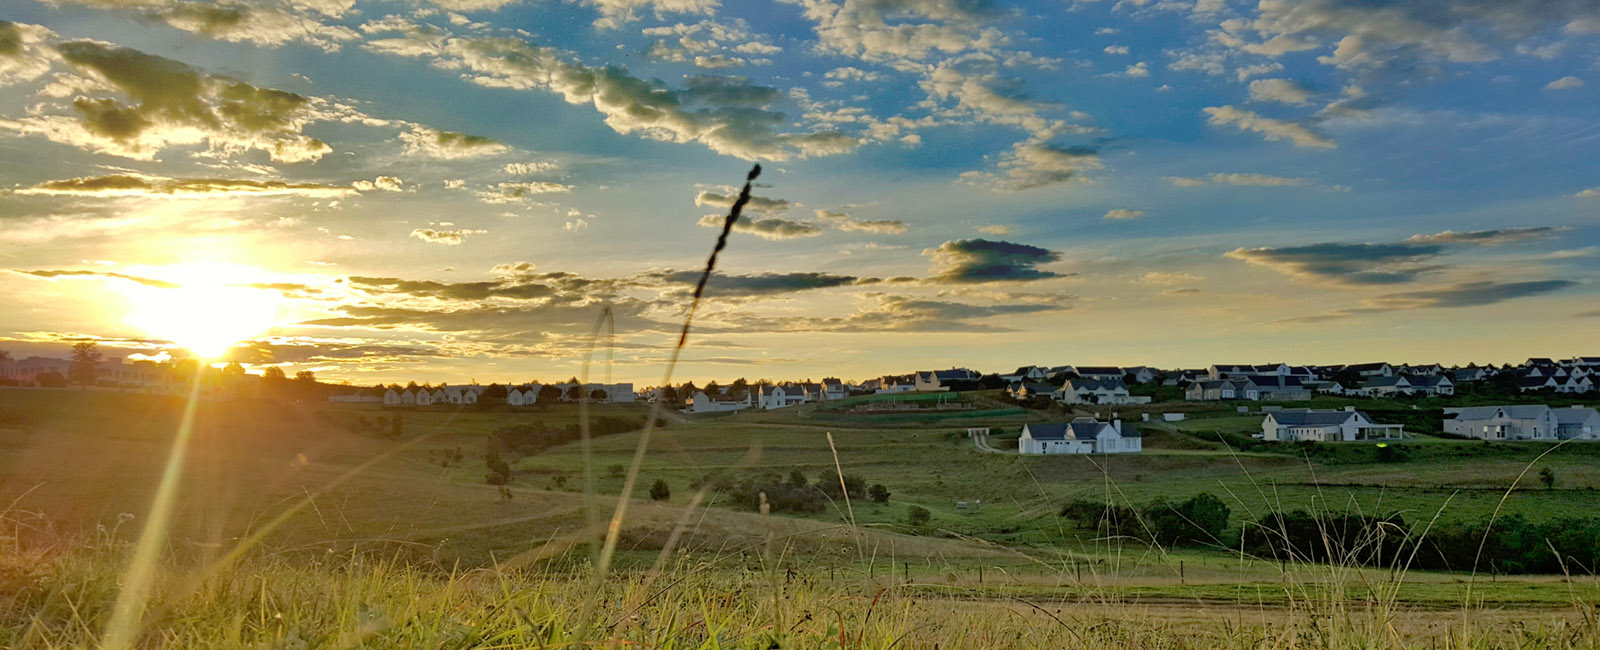 horses-garlington-estate-kzn-midlands-housing-countryside-country-farm-secure-hills